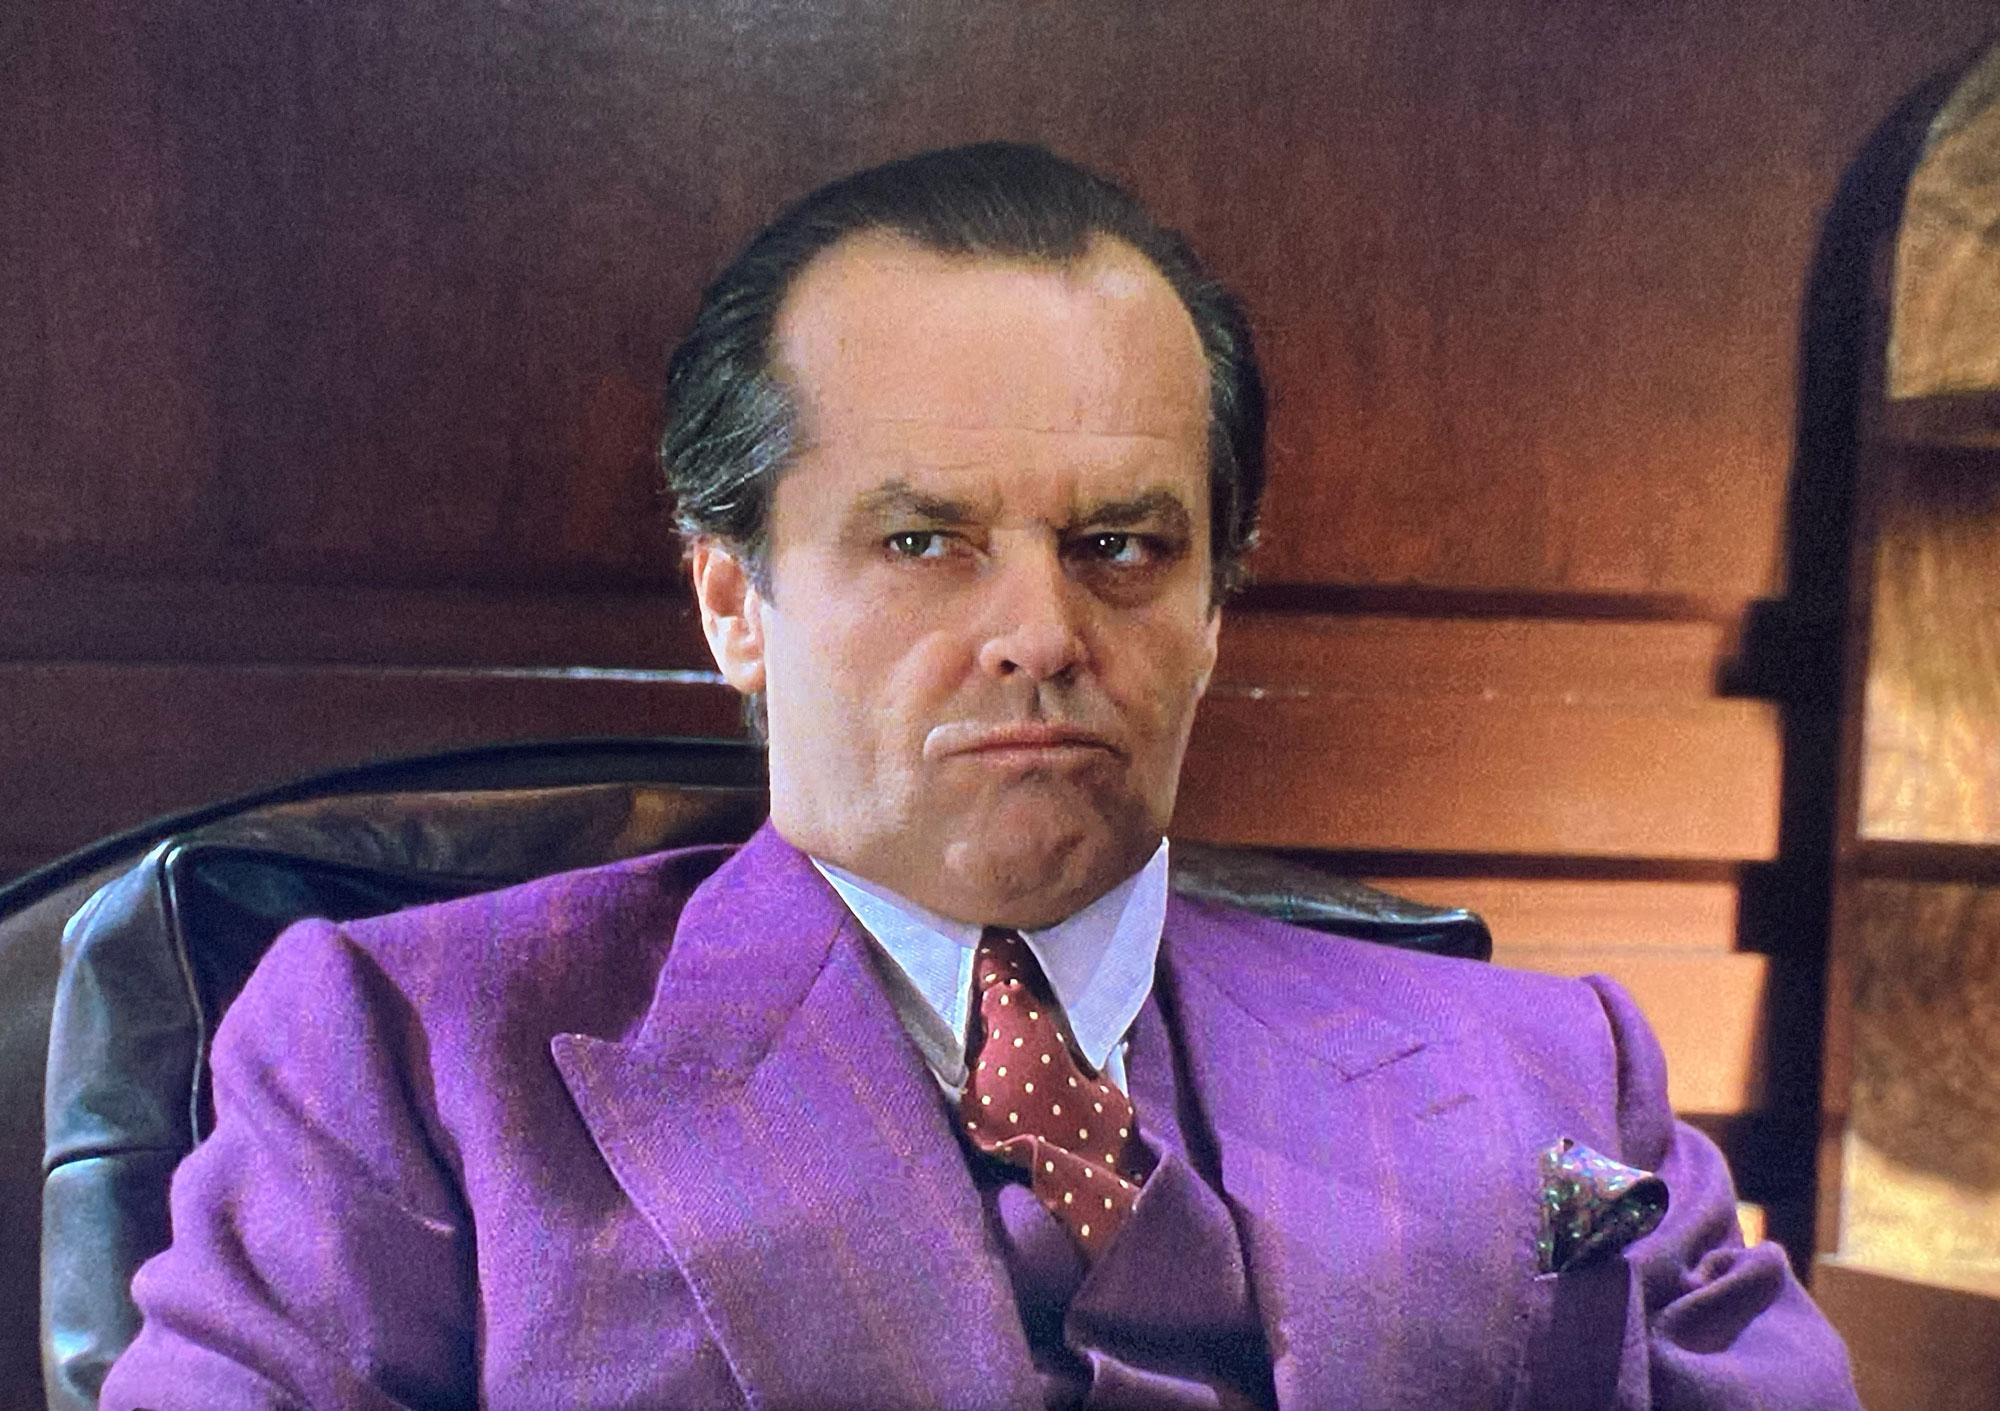 Jack Napier Batman in a purple striped suit cut by Terry Haste